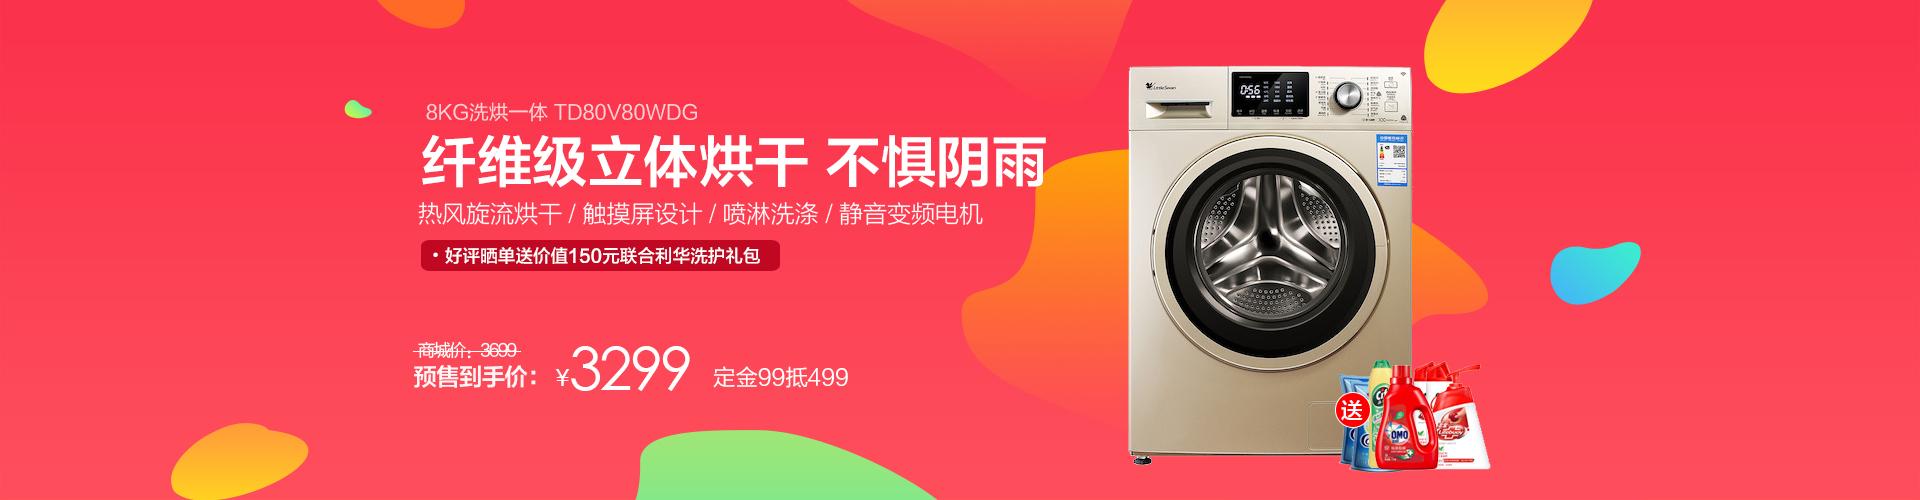 【4】活动-预售TD80V80WDG